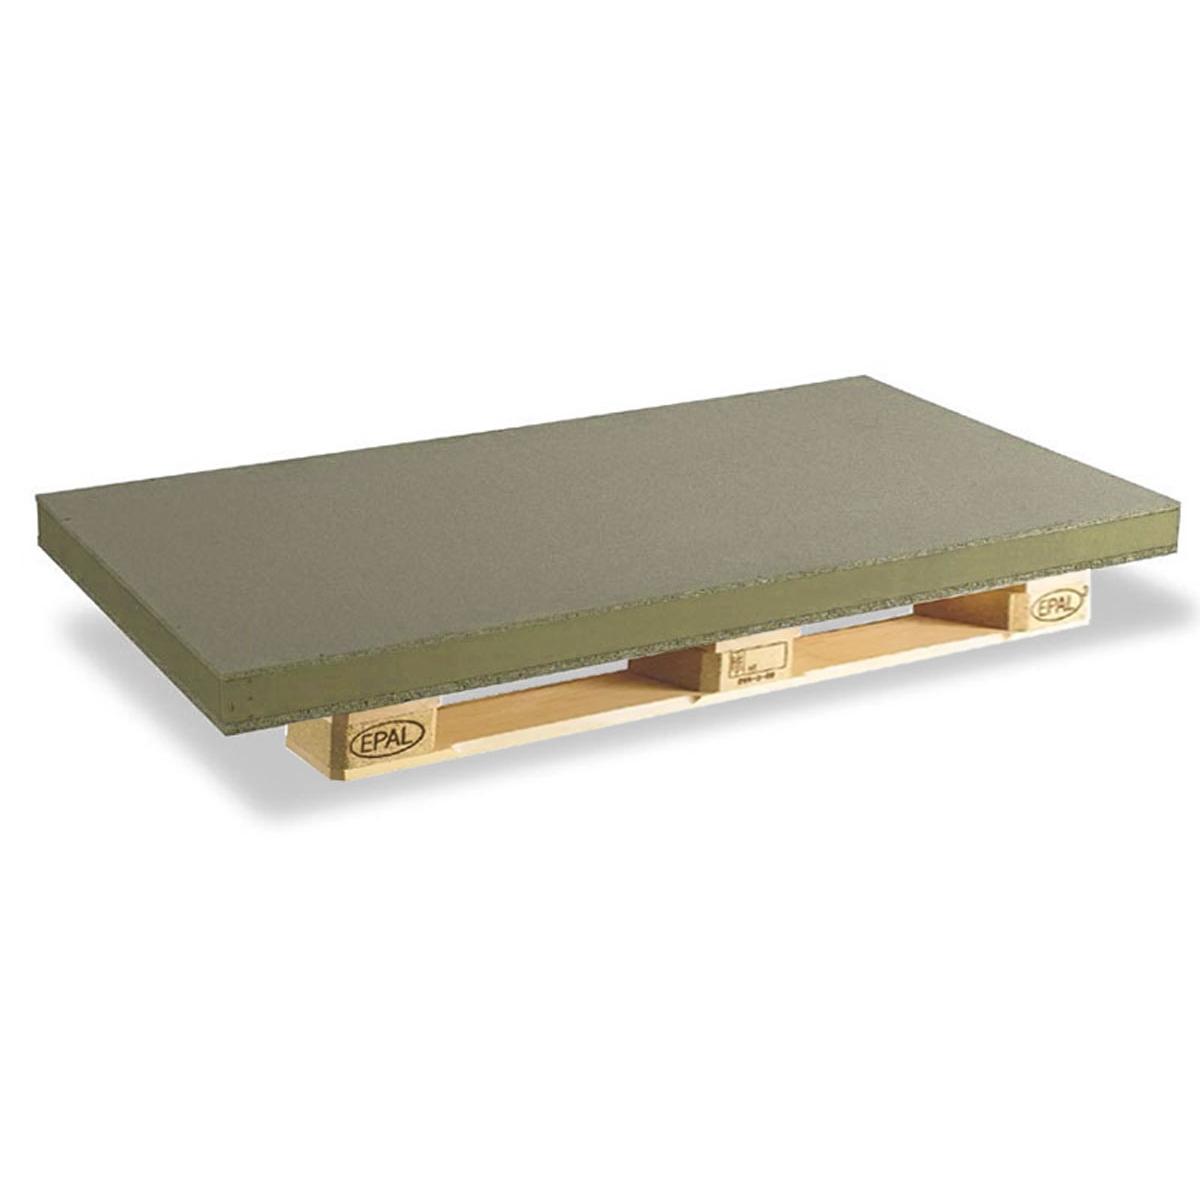 Plato de ducha rectangular 100x80 Coliseo Stone Nox Perla